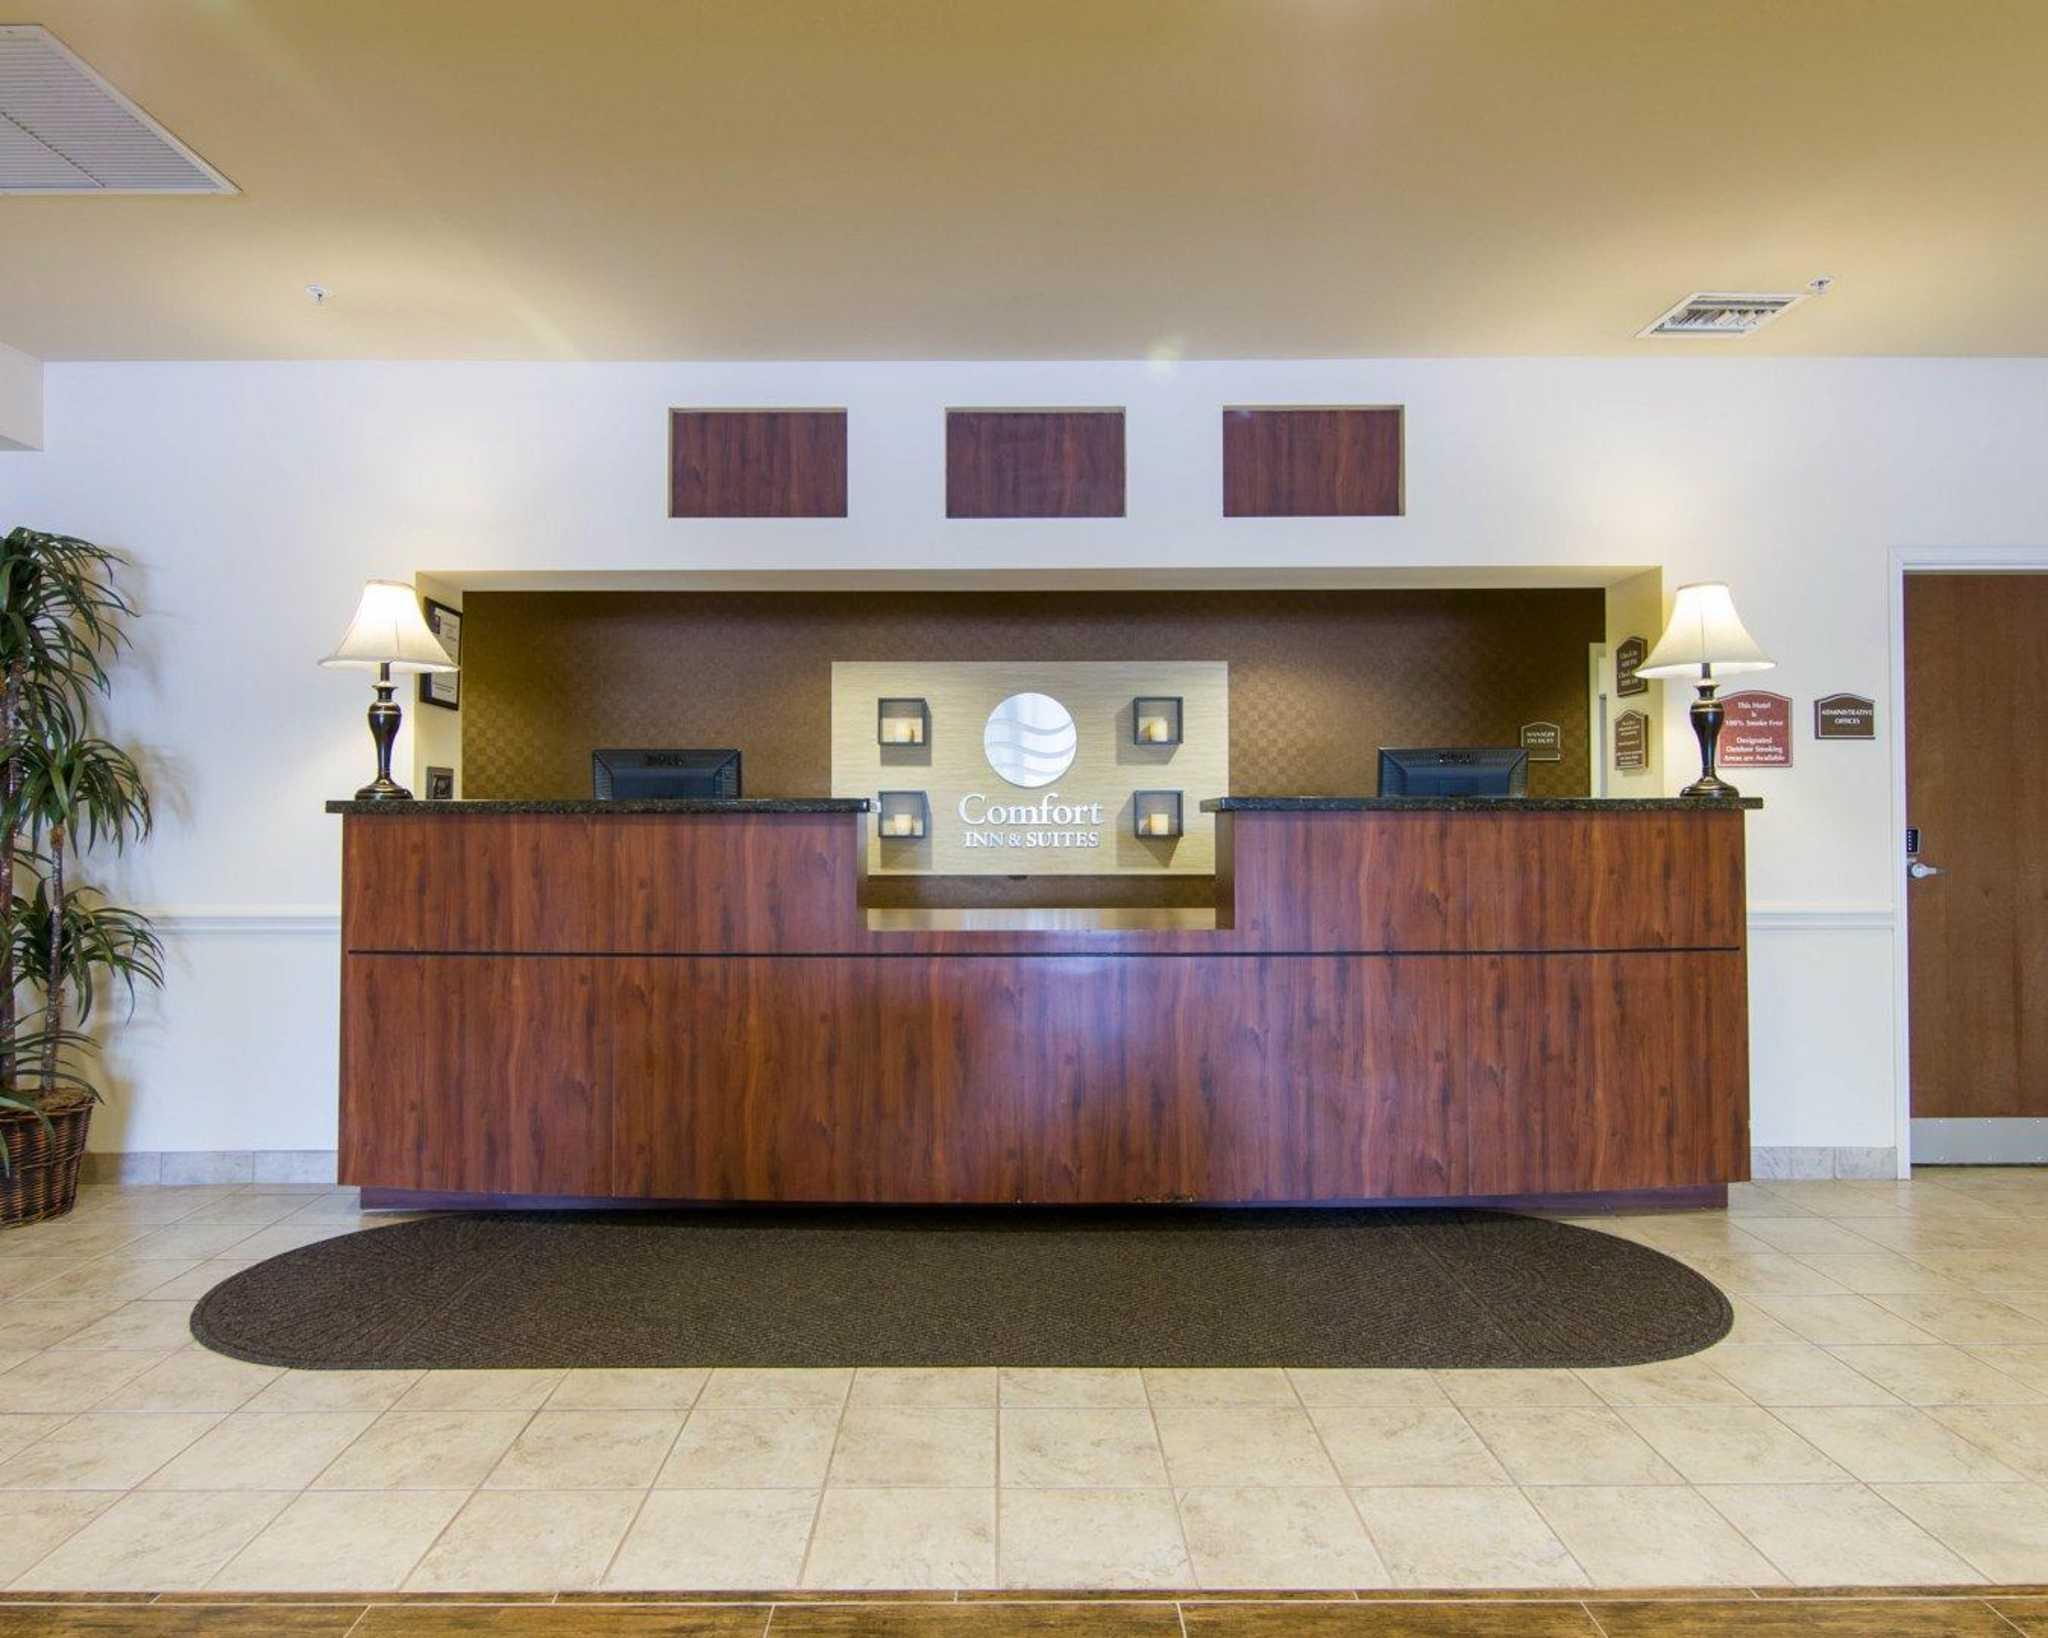 Comfort Inn & Suites Airport image 12